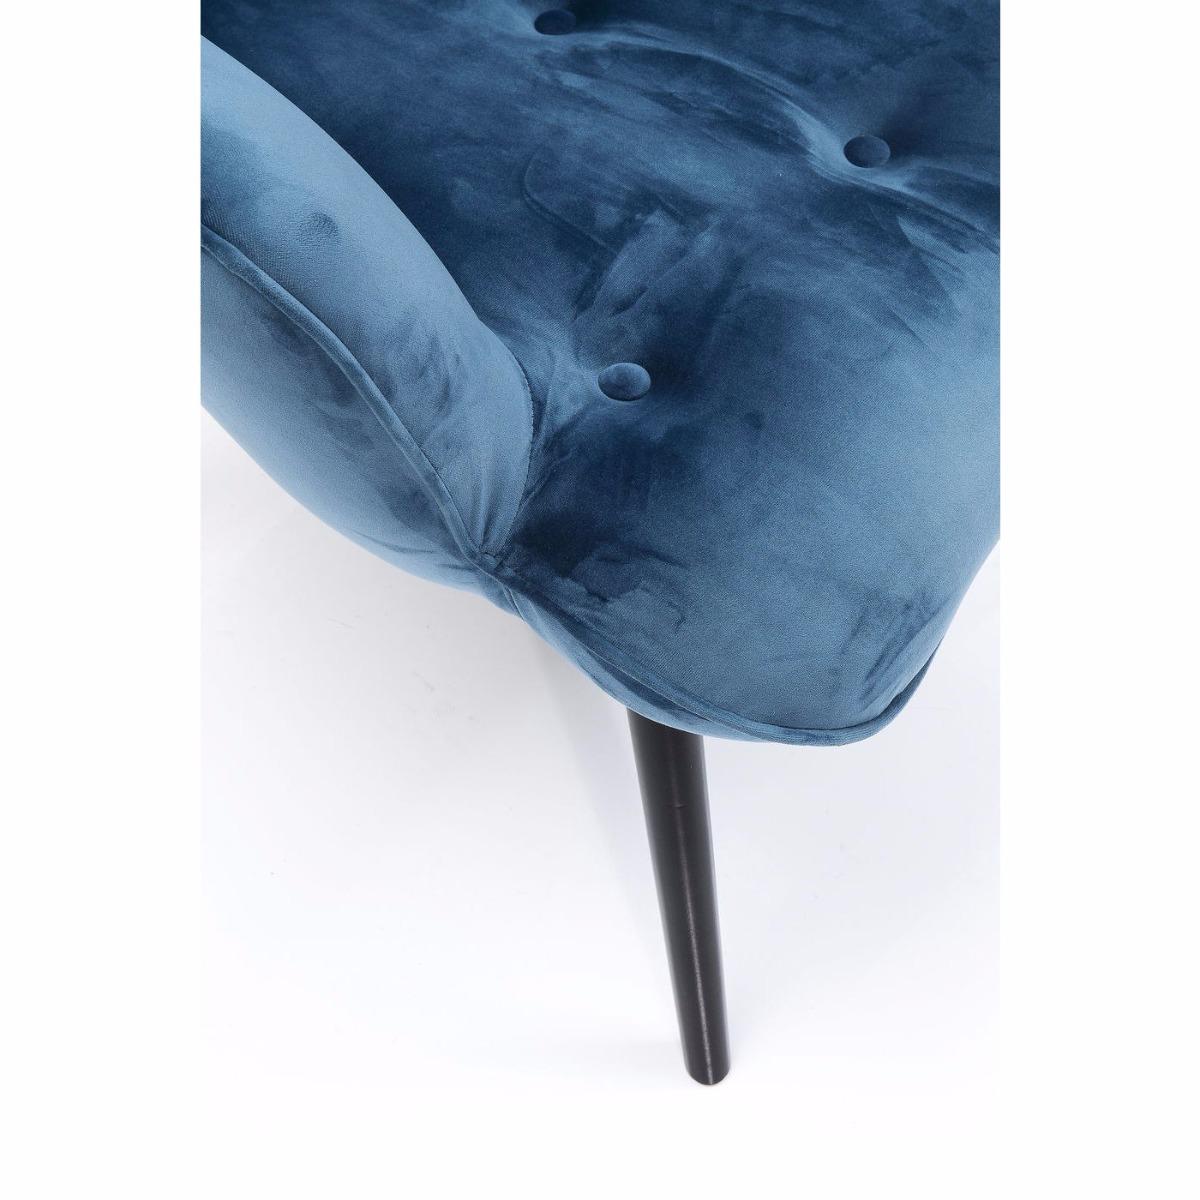 Kare Design Fauteuil Vicky Zithoogte 43 Cm - Velvet Stof Petrol